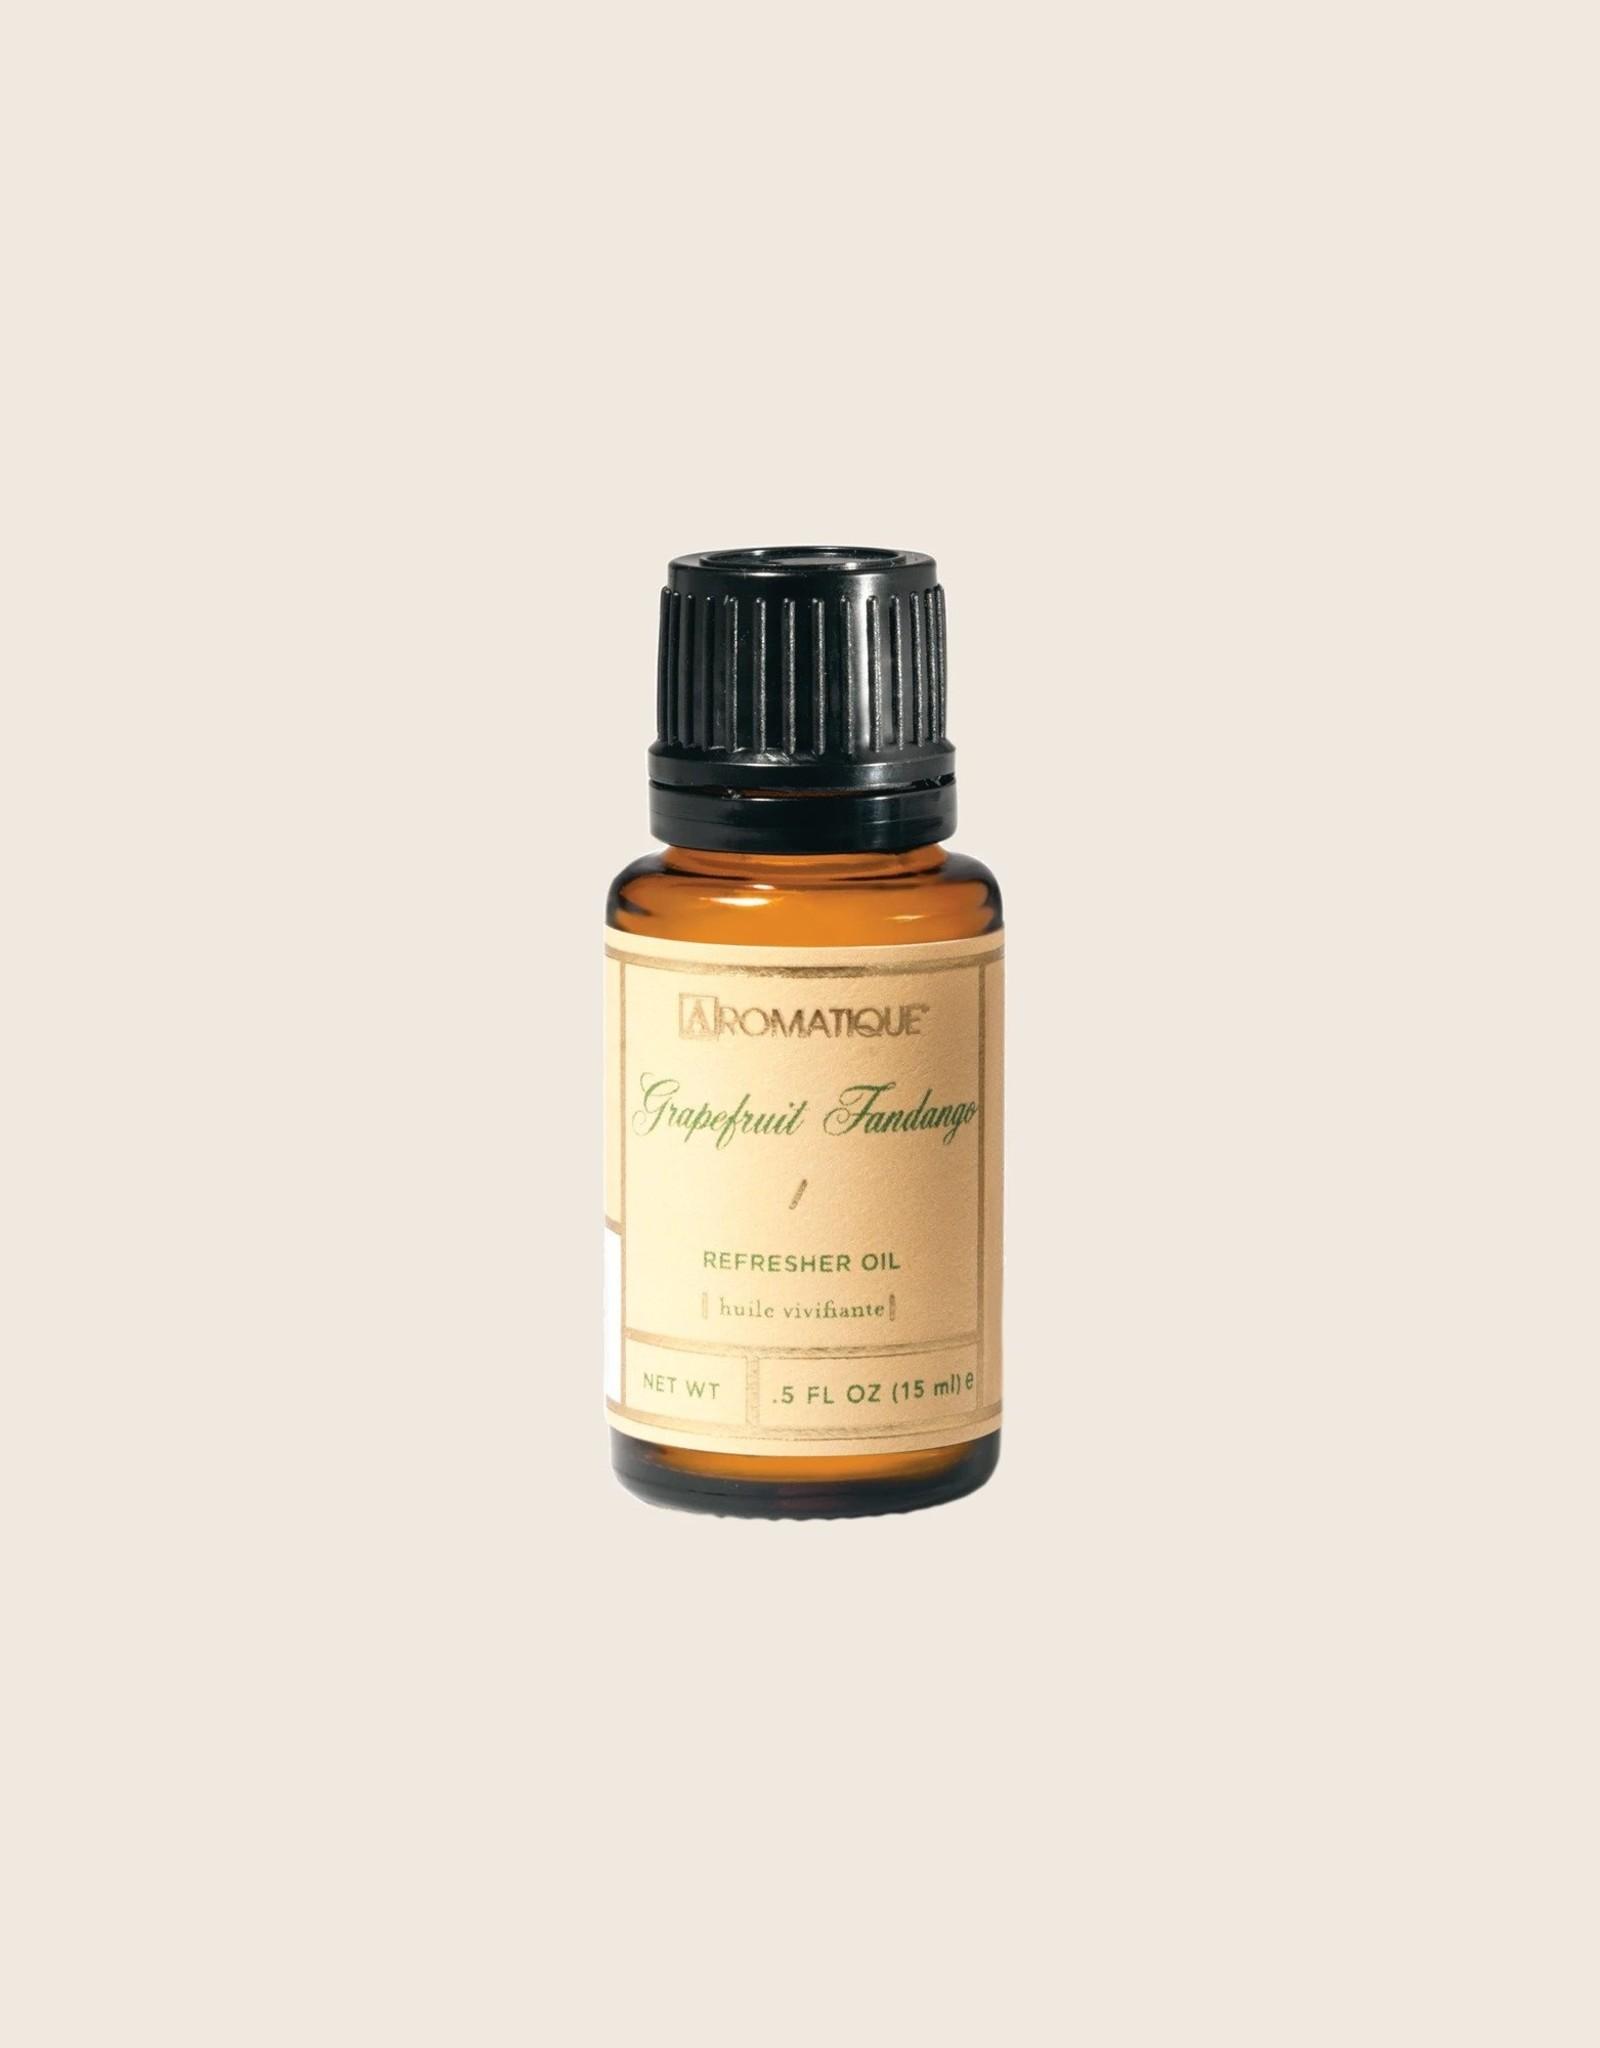 Aromatique Refresher Oil 0.5fl oz -